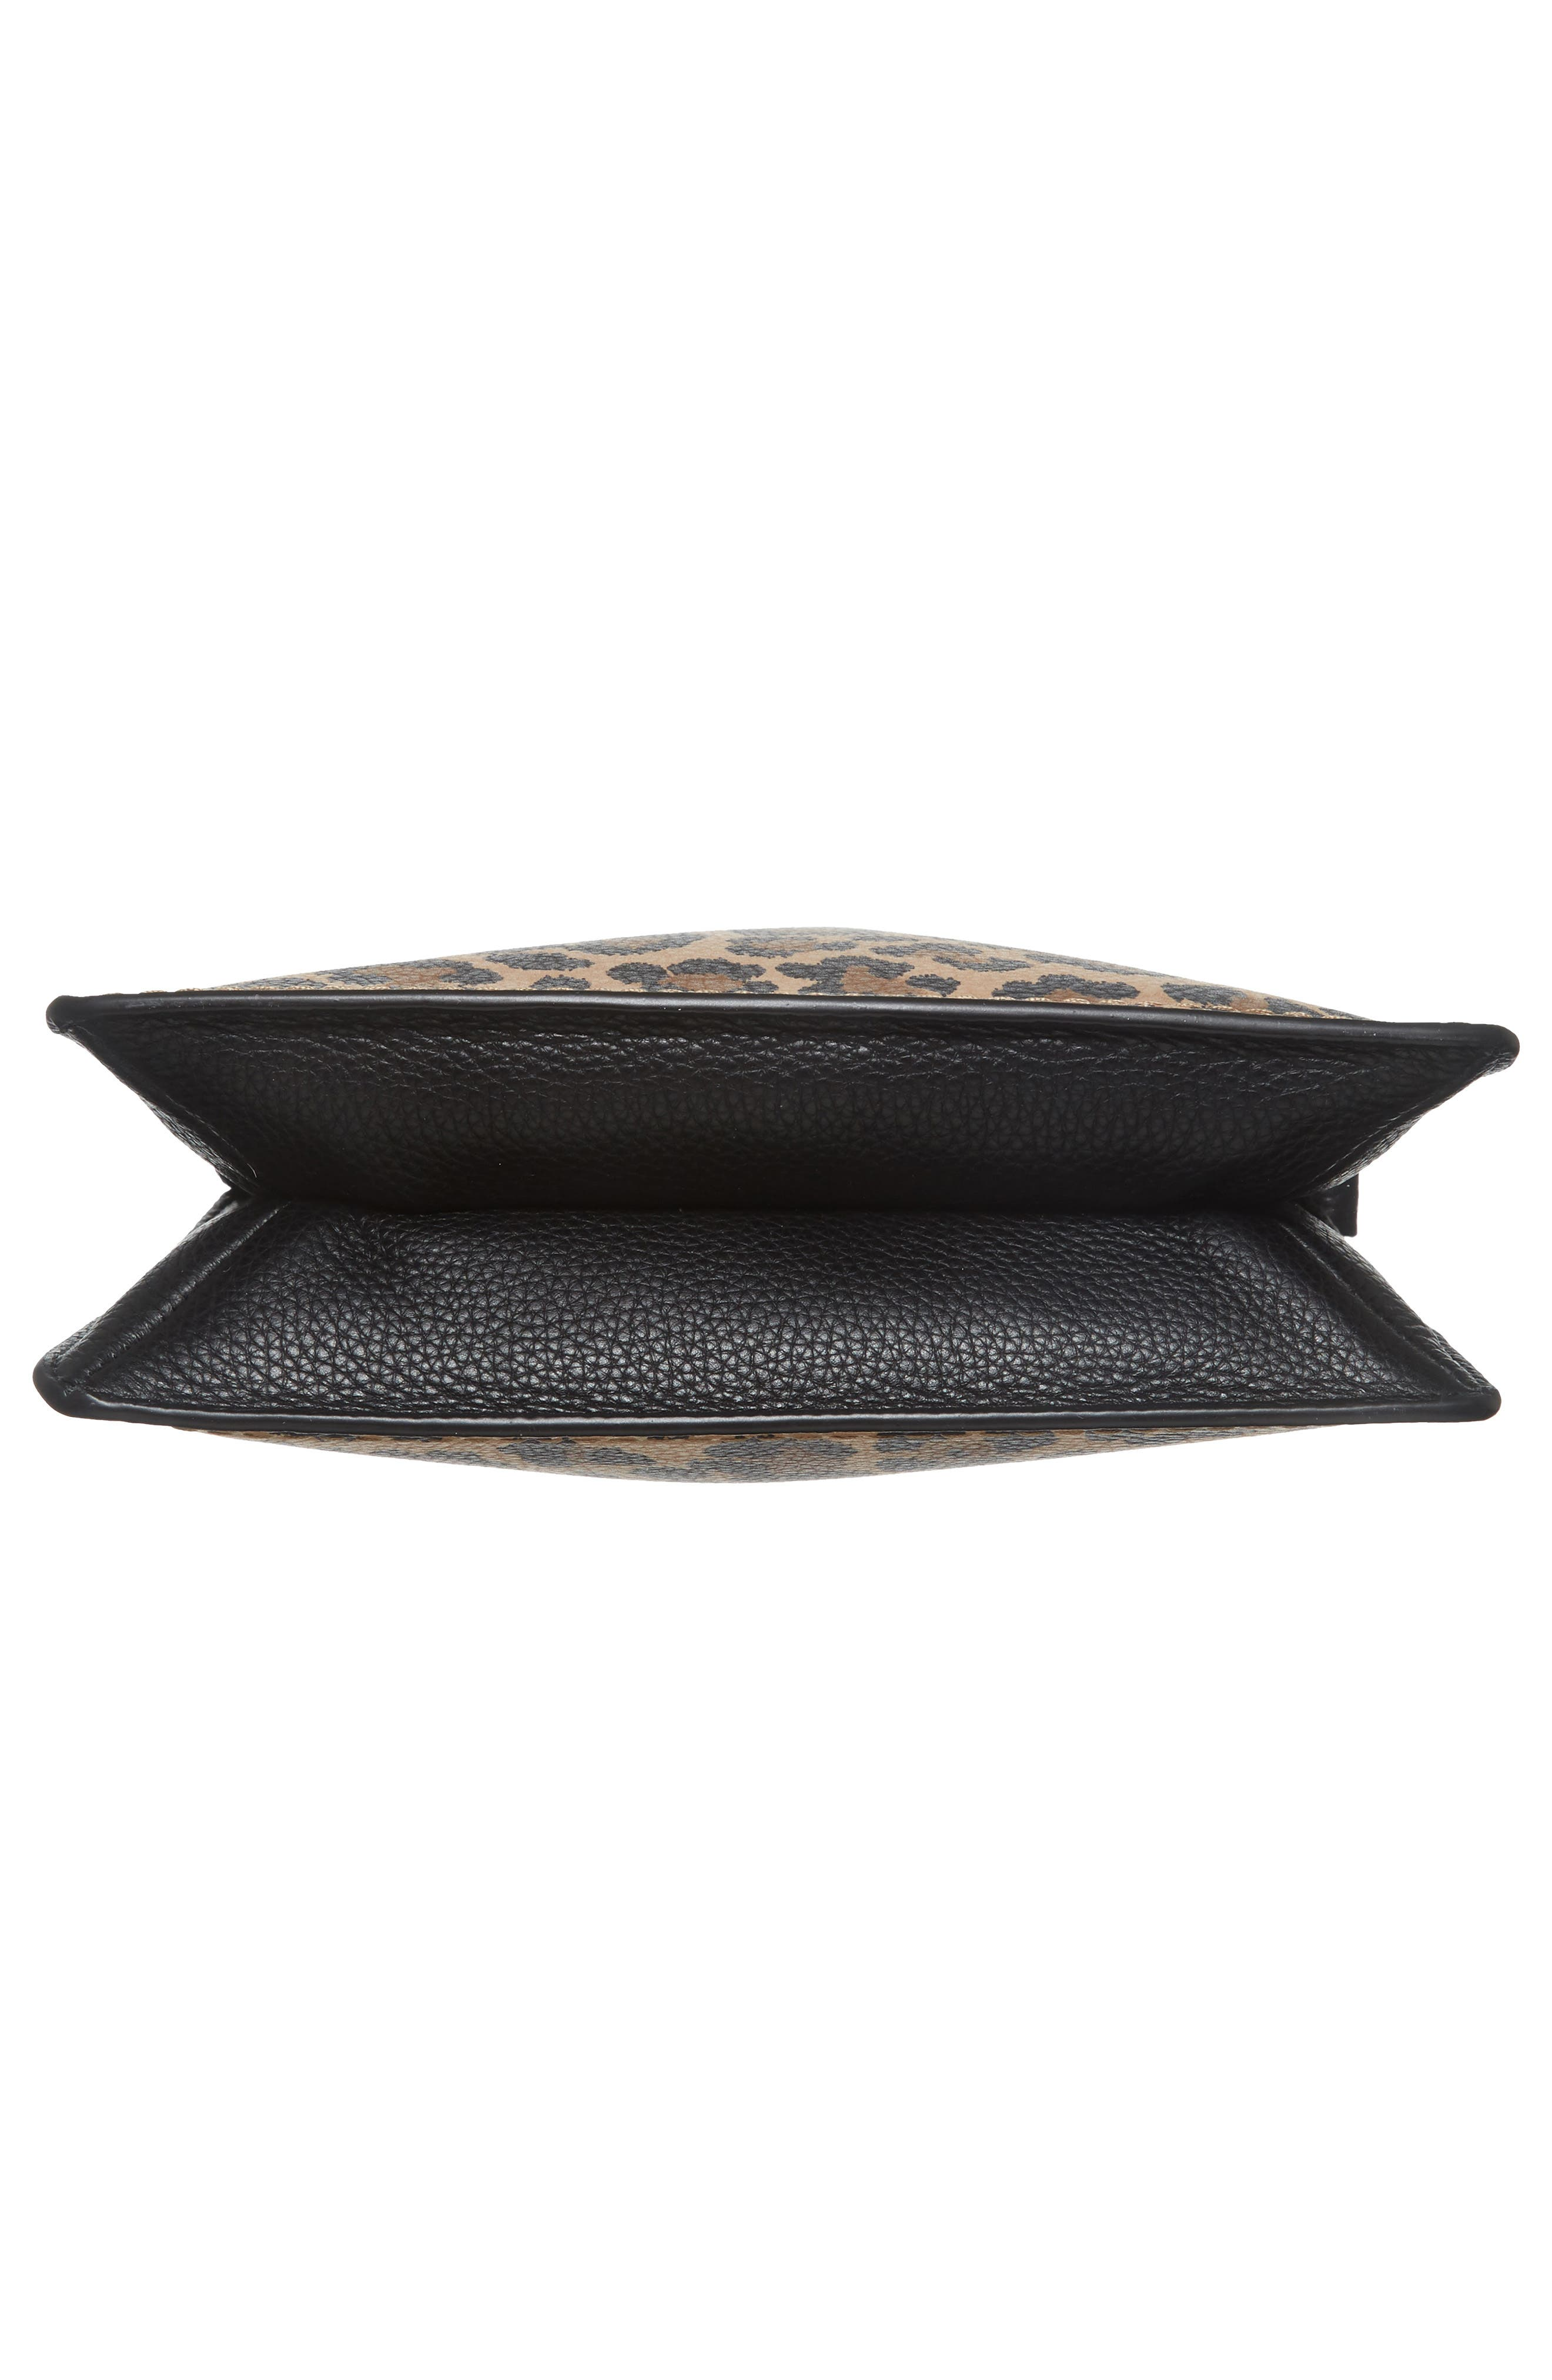 dunne lane - leopard caro leather crossbody bag,                             Alternate thumbnail 6, color,                             200